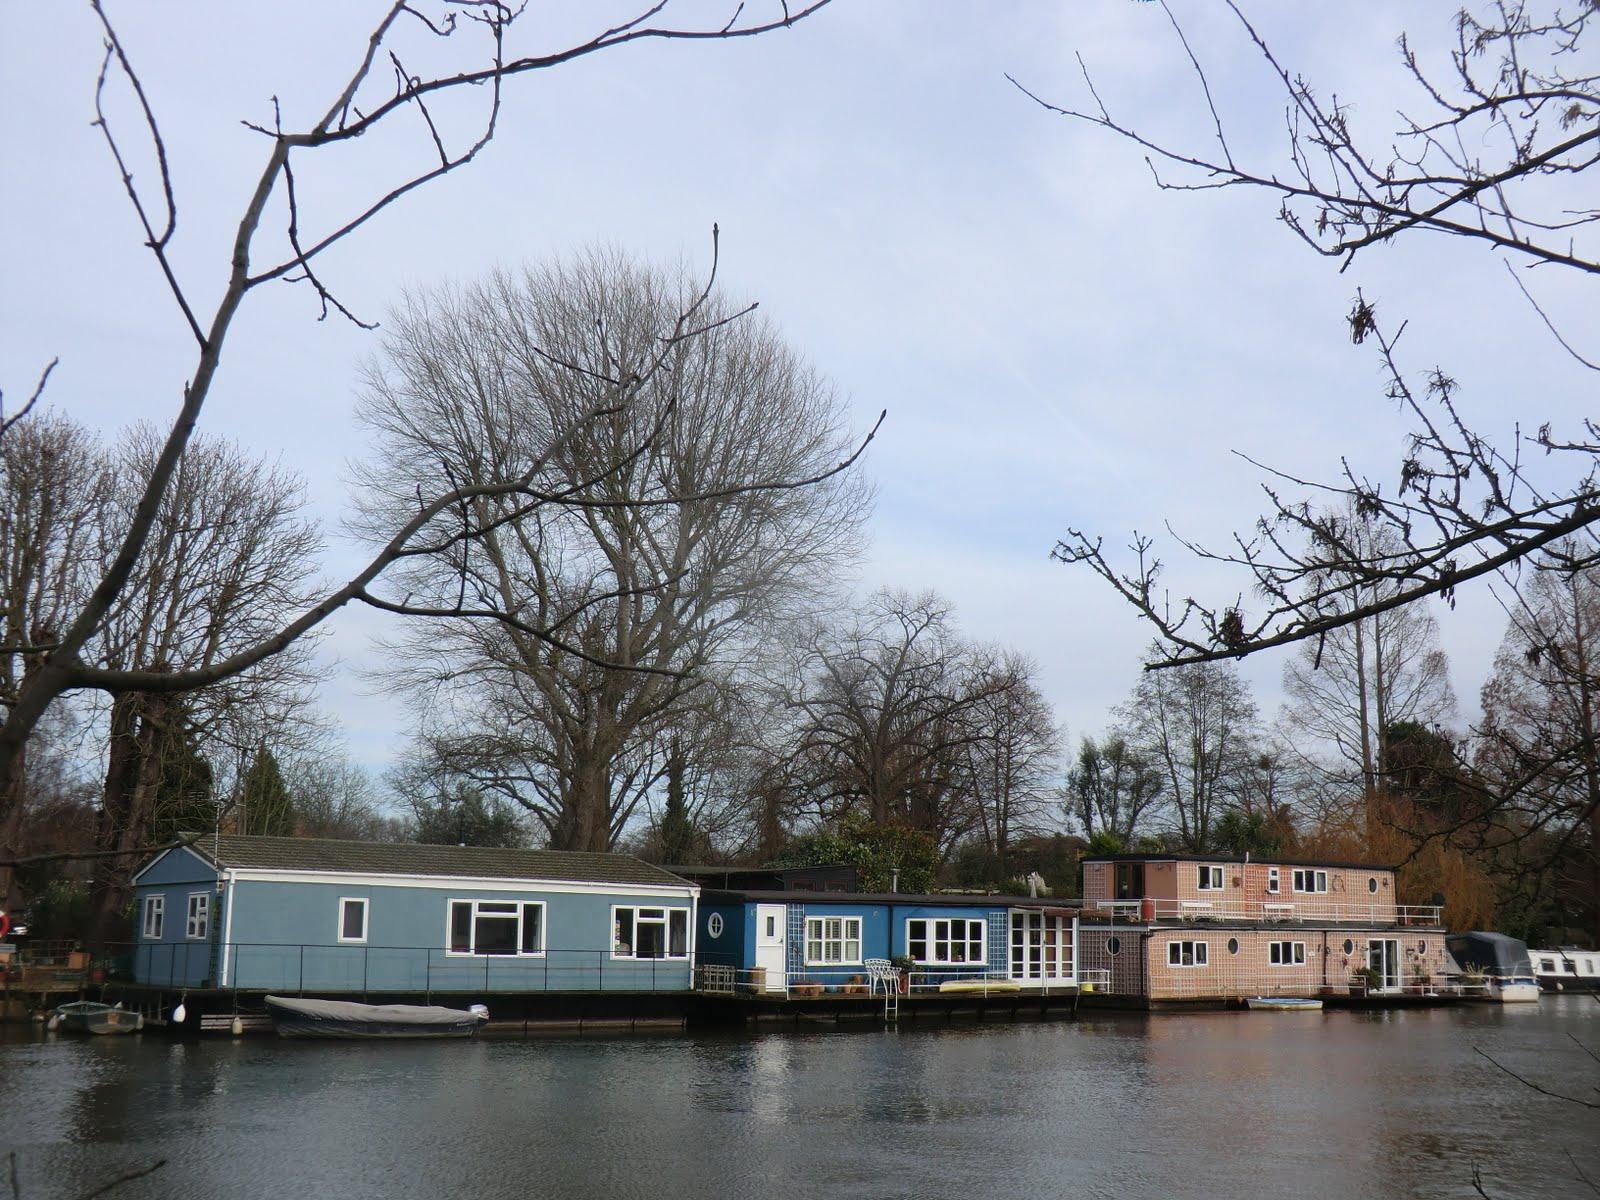 CIMG2691 Houseboats, Tagg's Island